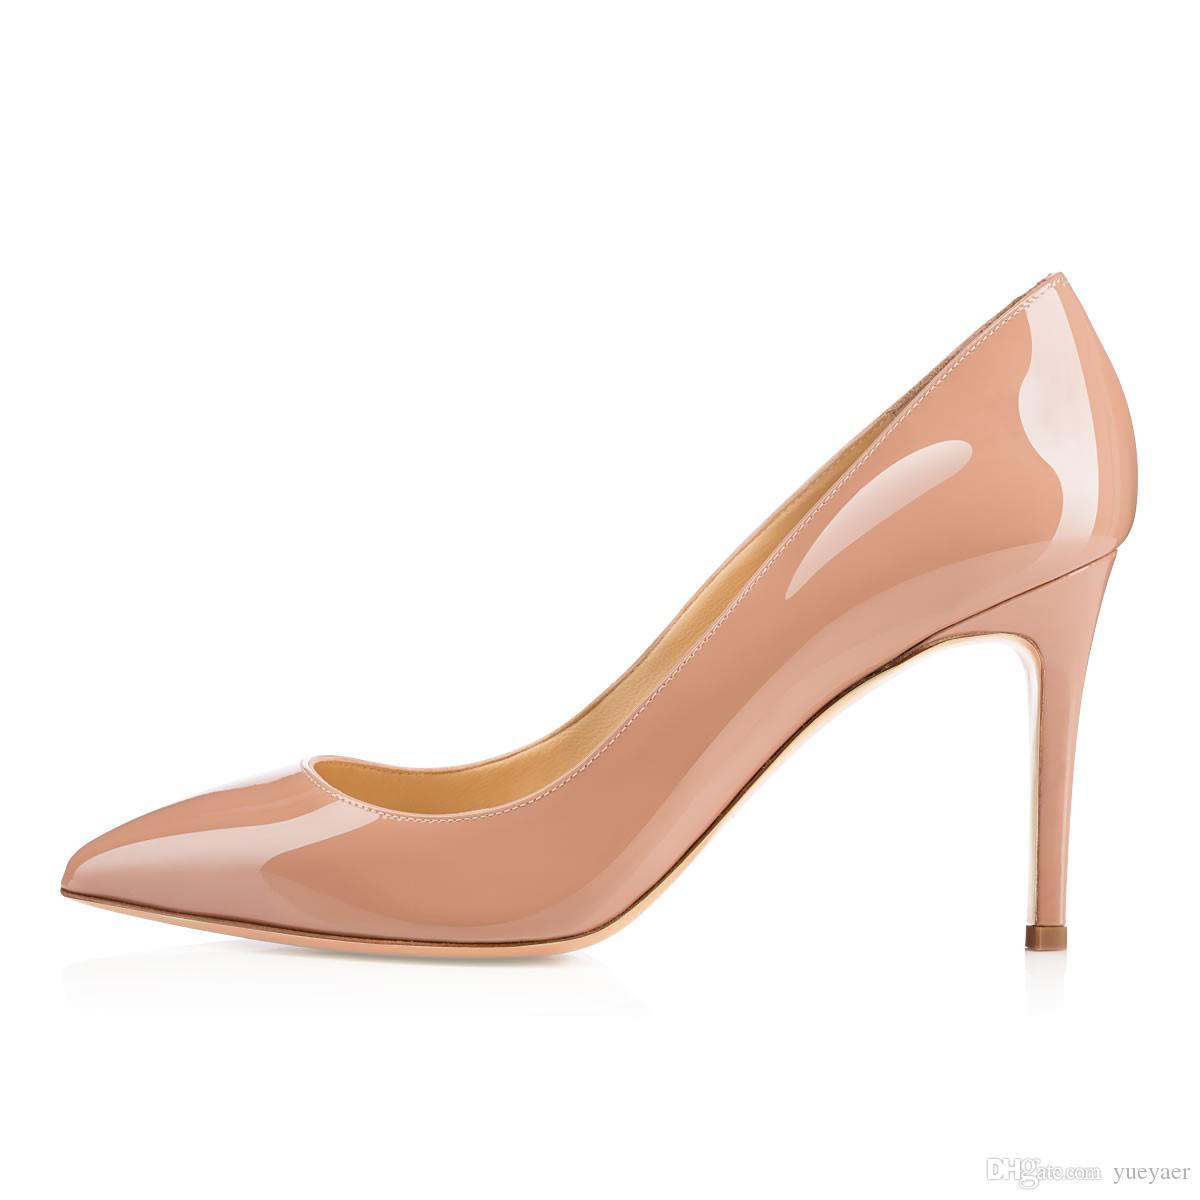 Karmran das senhoras das mulheres handmade marca de moda bigalle 85mm estilo francês simples office party bombas de sapatos bege z6286